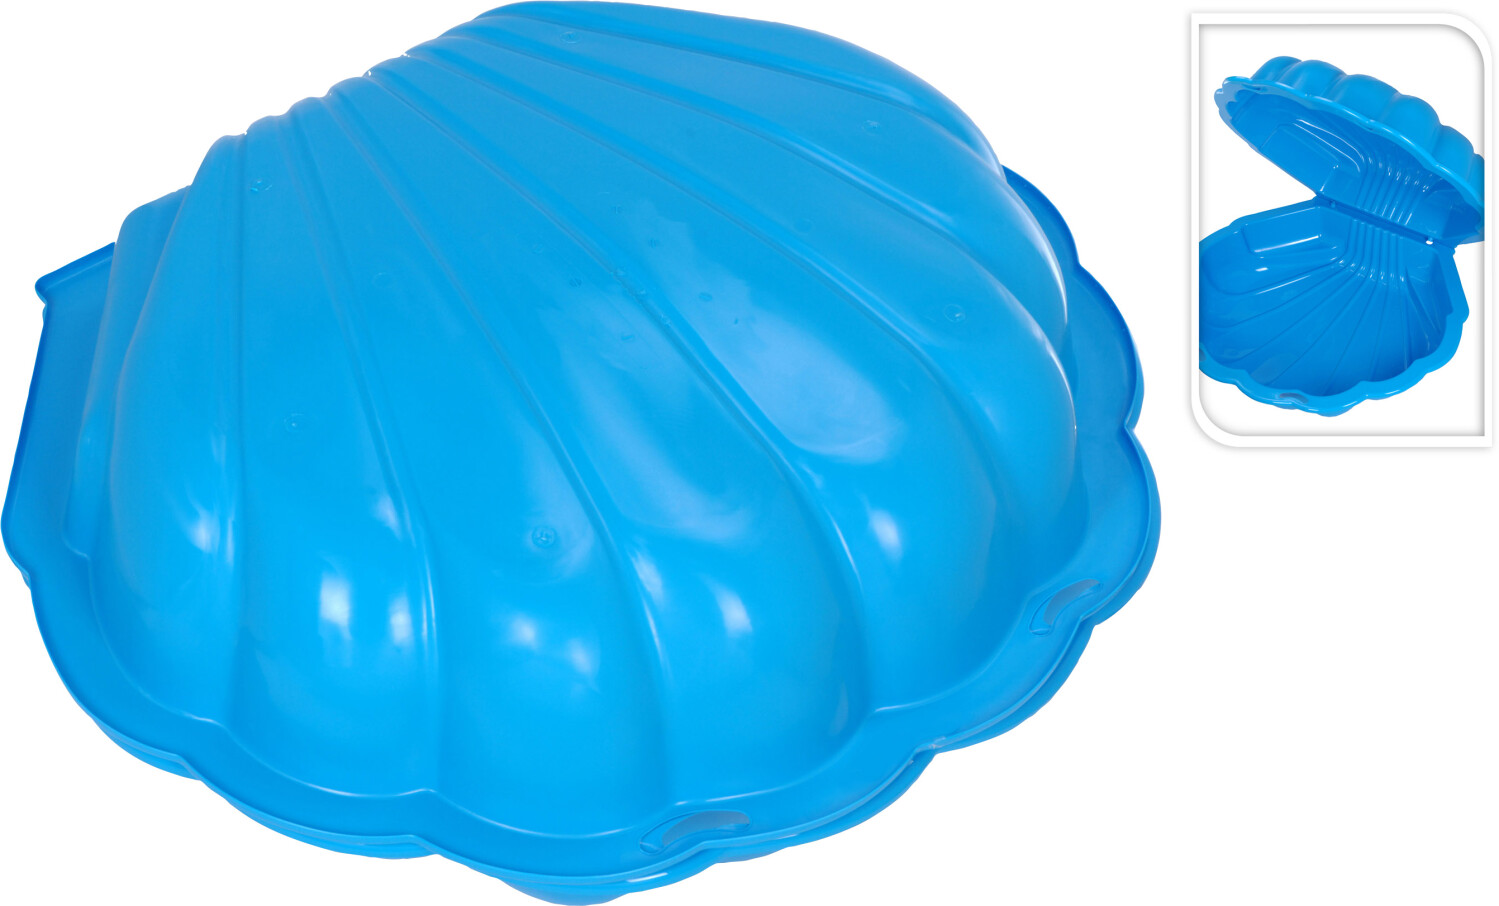 Zandbak schelp blauw 2 delig